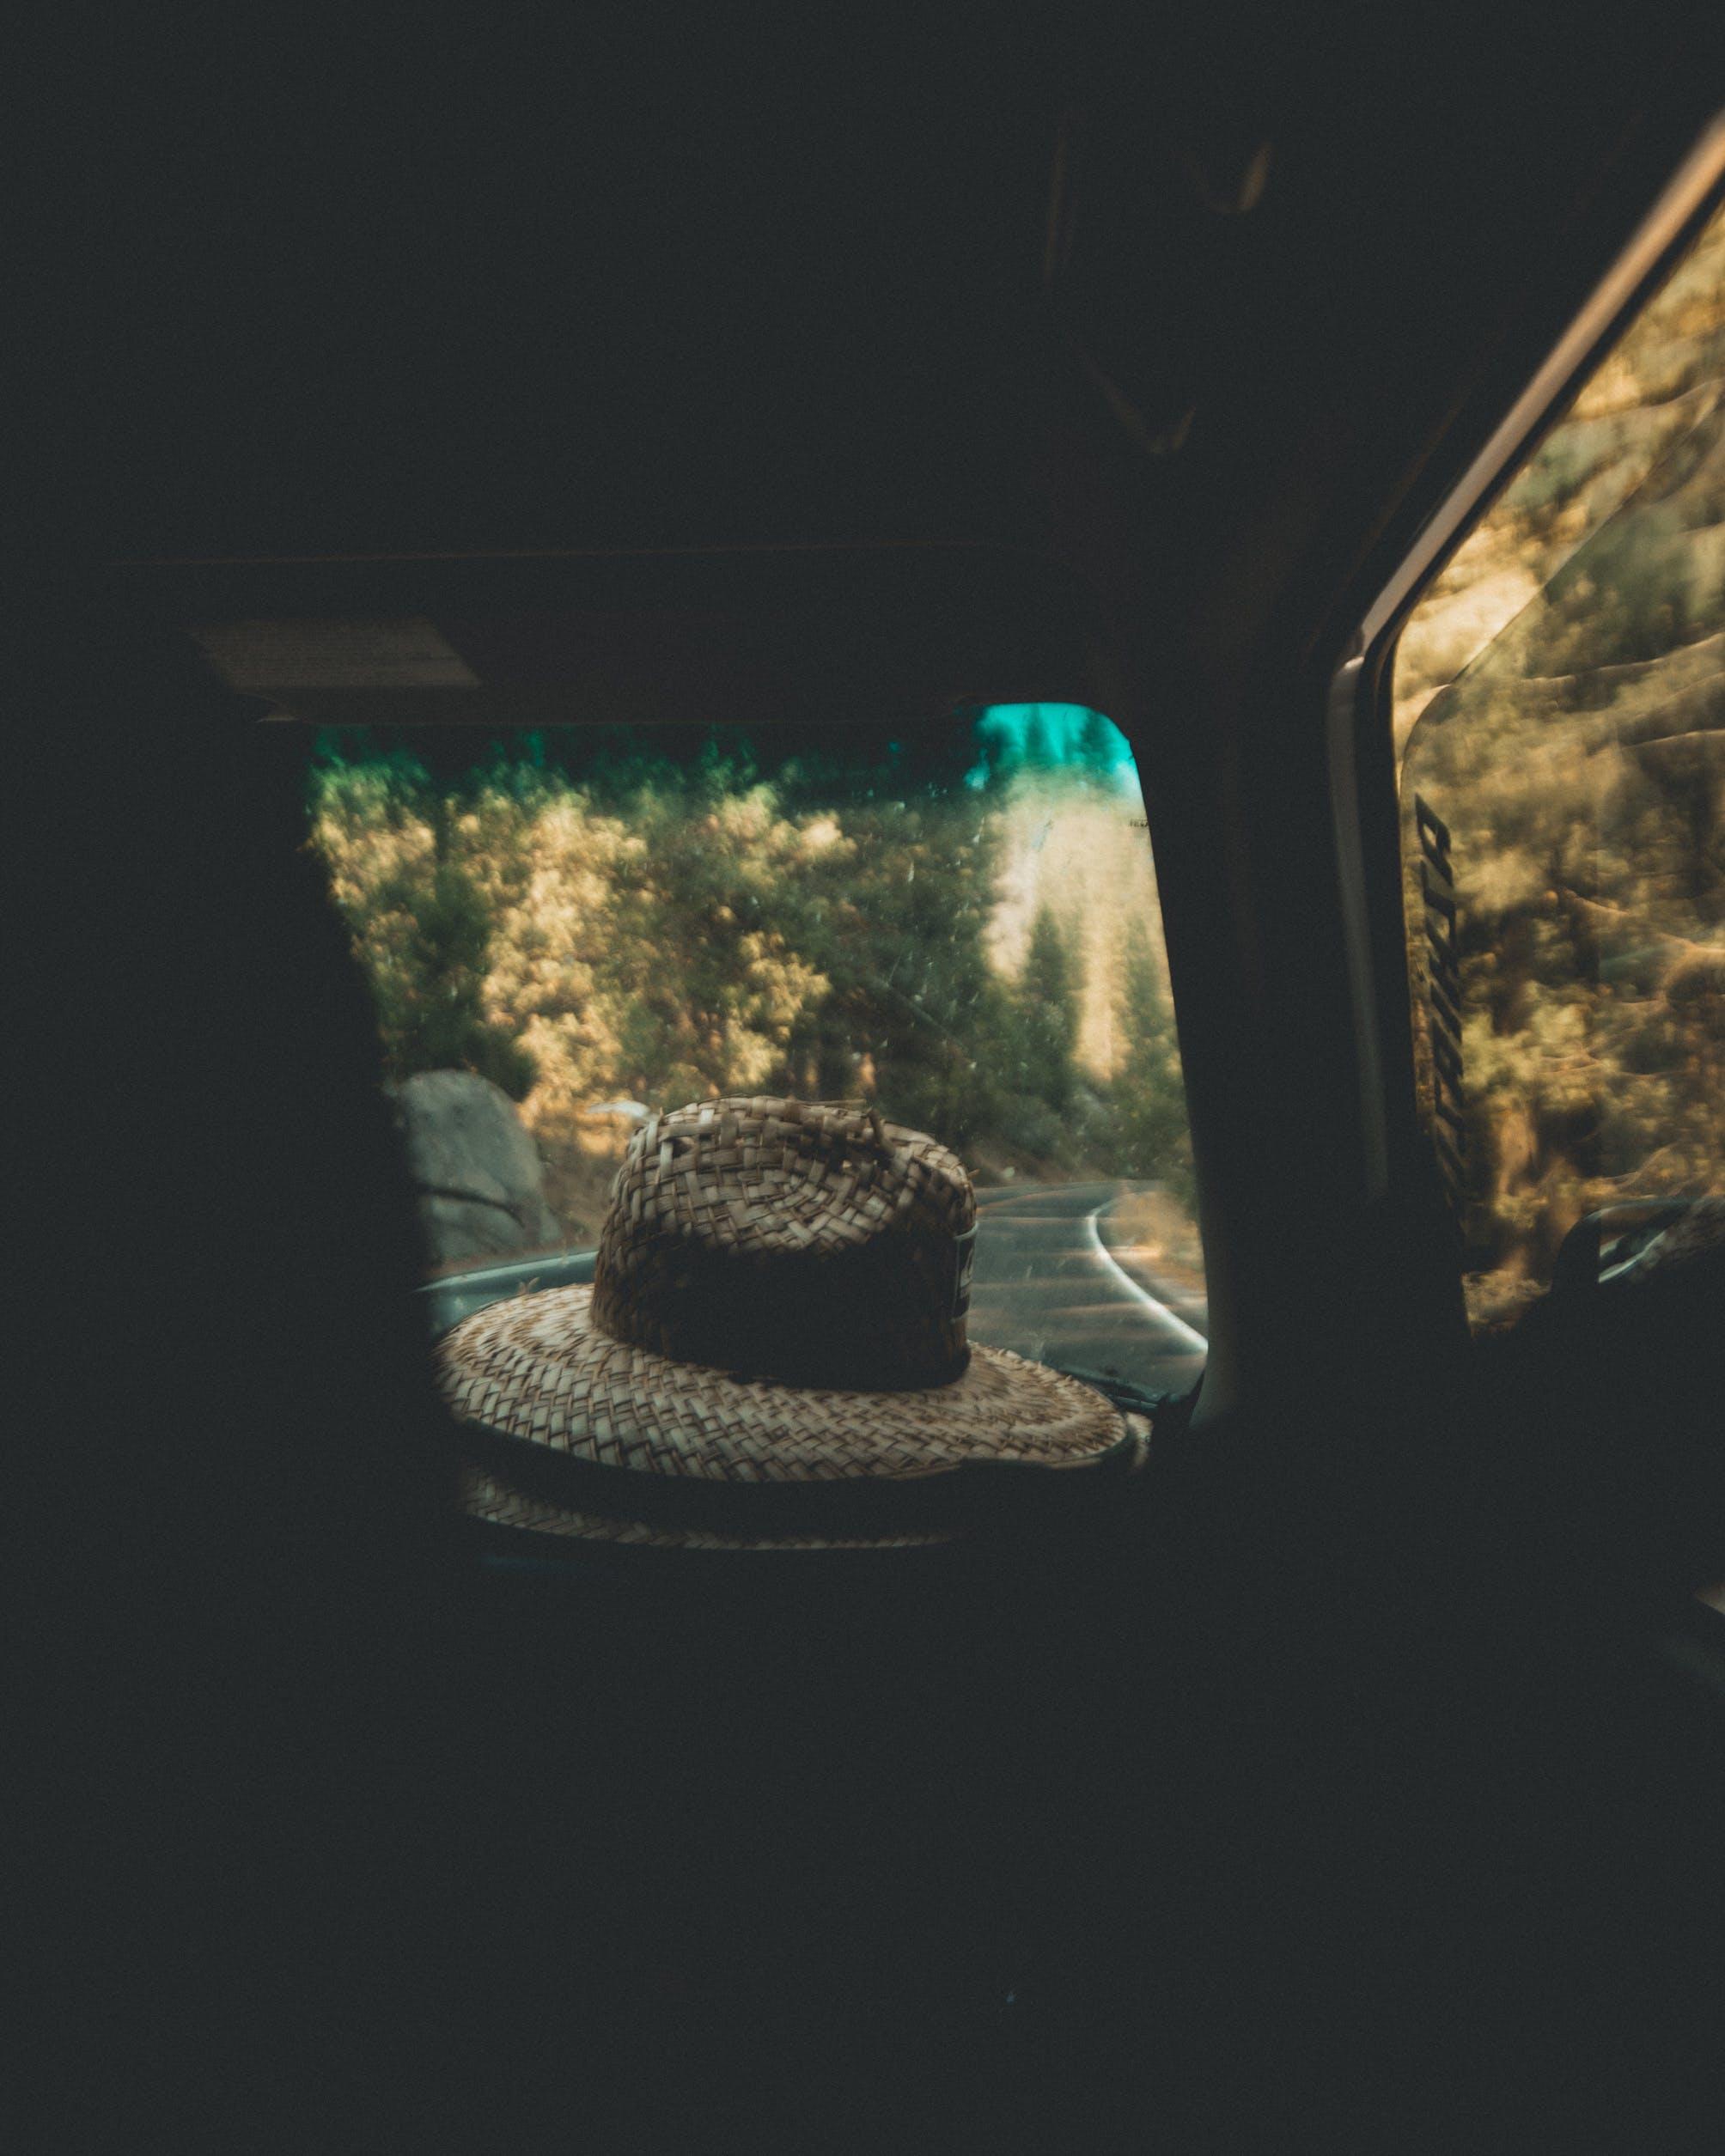 Free stock photo of road, nature, dark, travelling